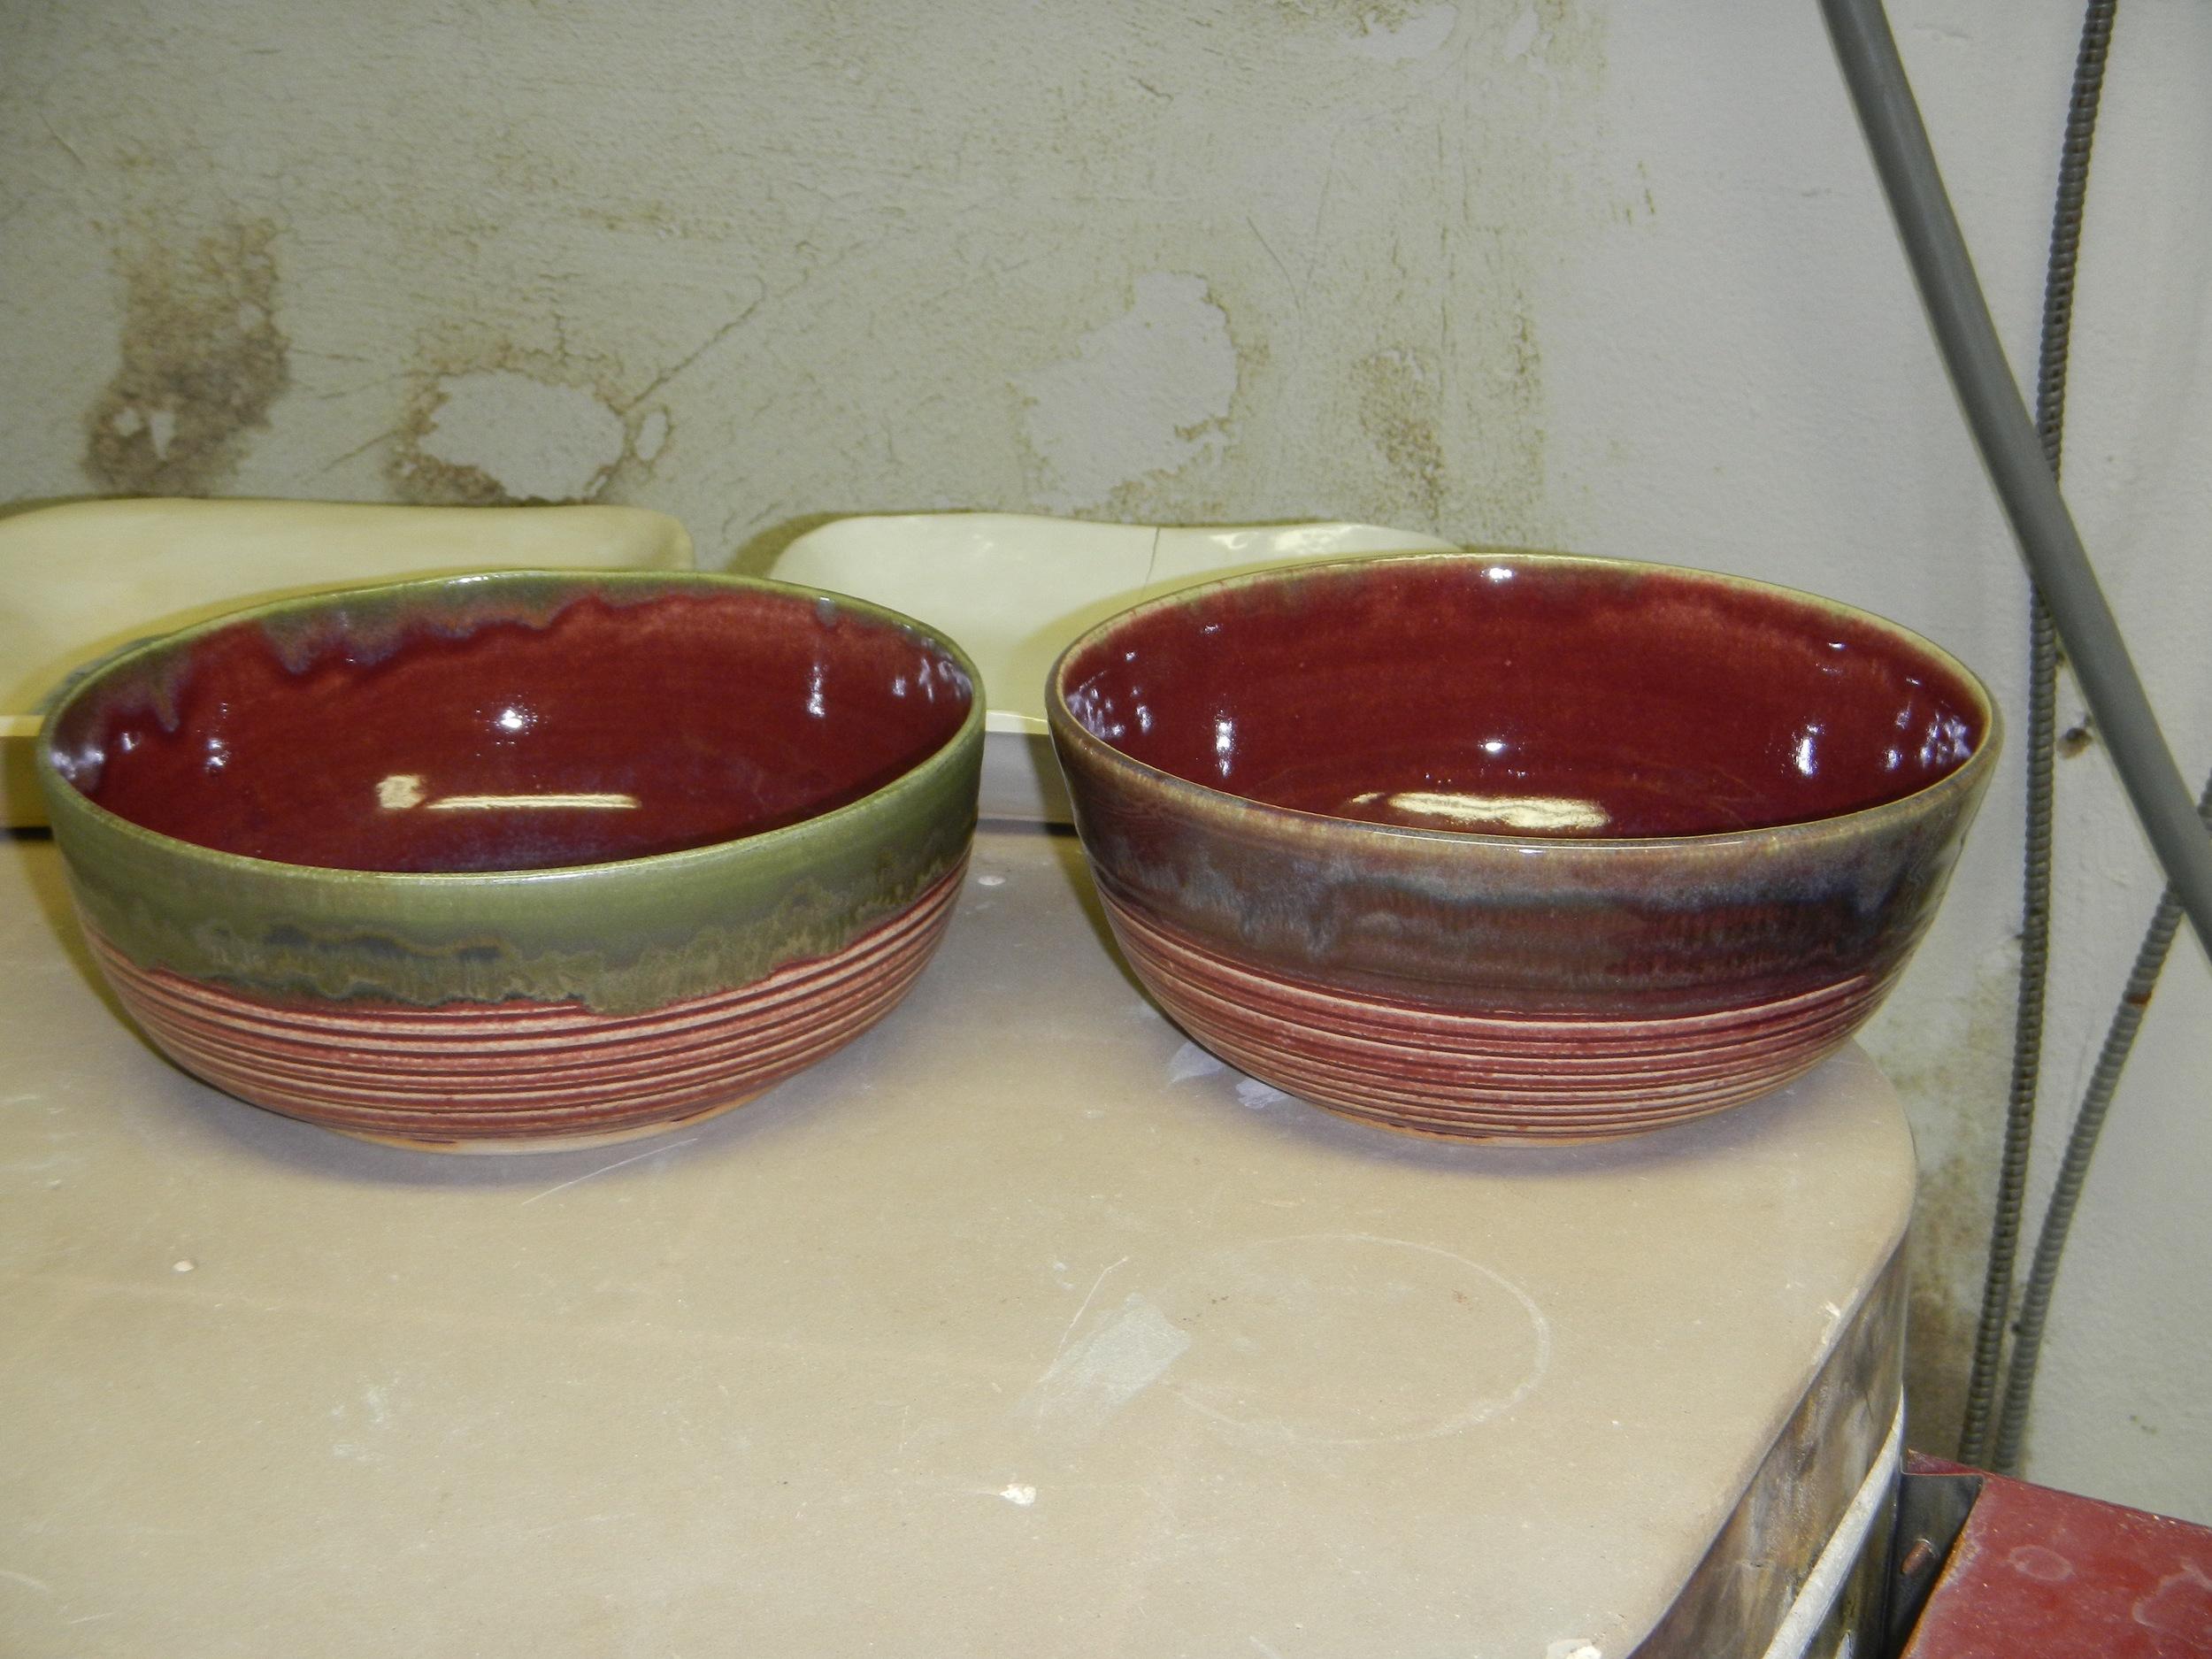 (Interesting...the green glaze on bare rim, vs the green glaze over the red glaze)